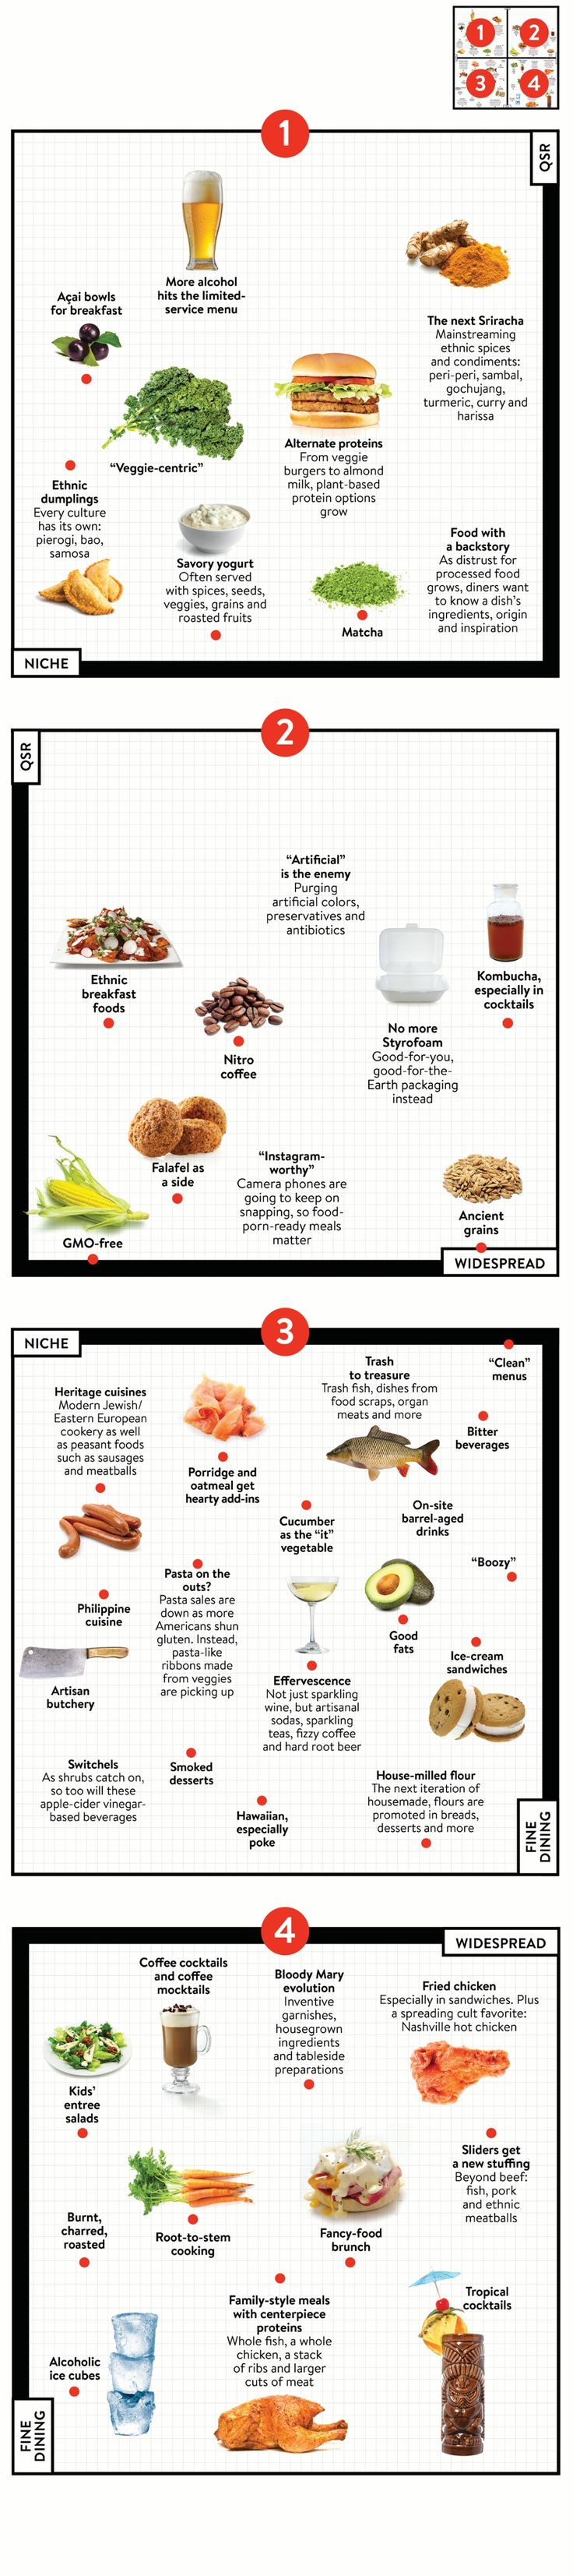 Plotting menu trends for 2016 restaurant business